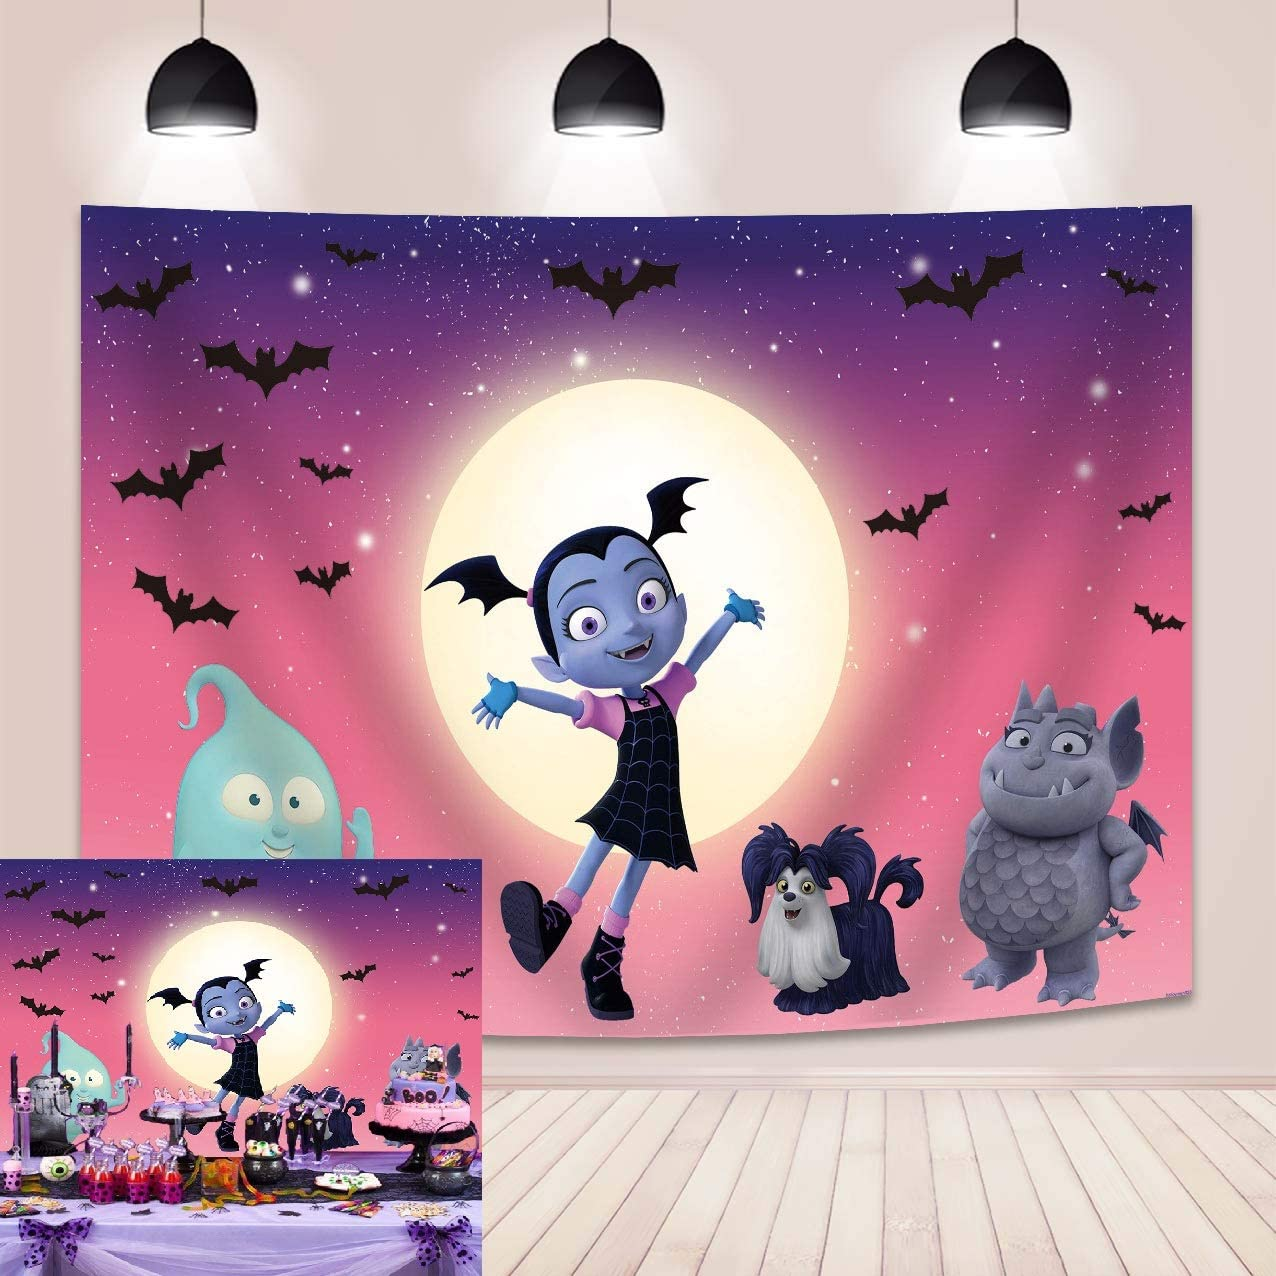 Halloween Backdrop Pink Vampirina Girl Moon Bat Ghost Photography Background Halloween Theme Party Decoration Photo Studio Props 5x3FT